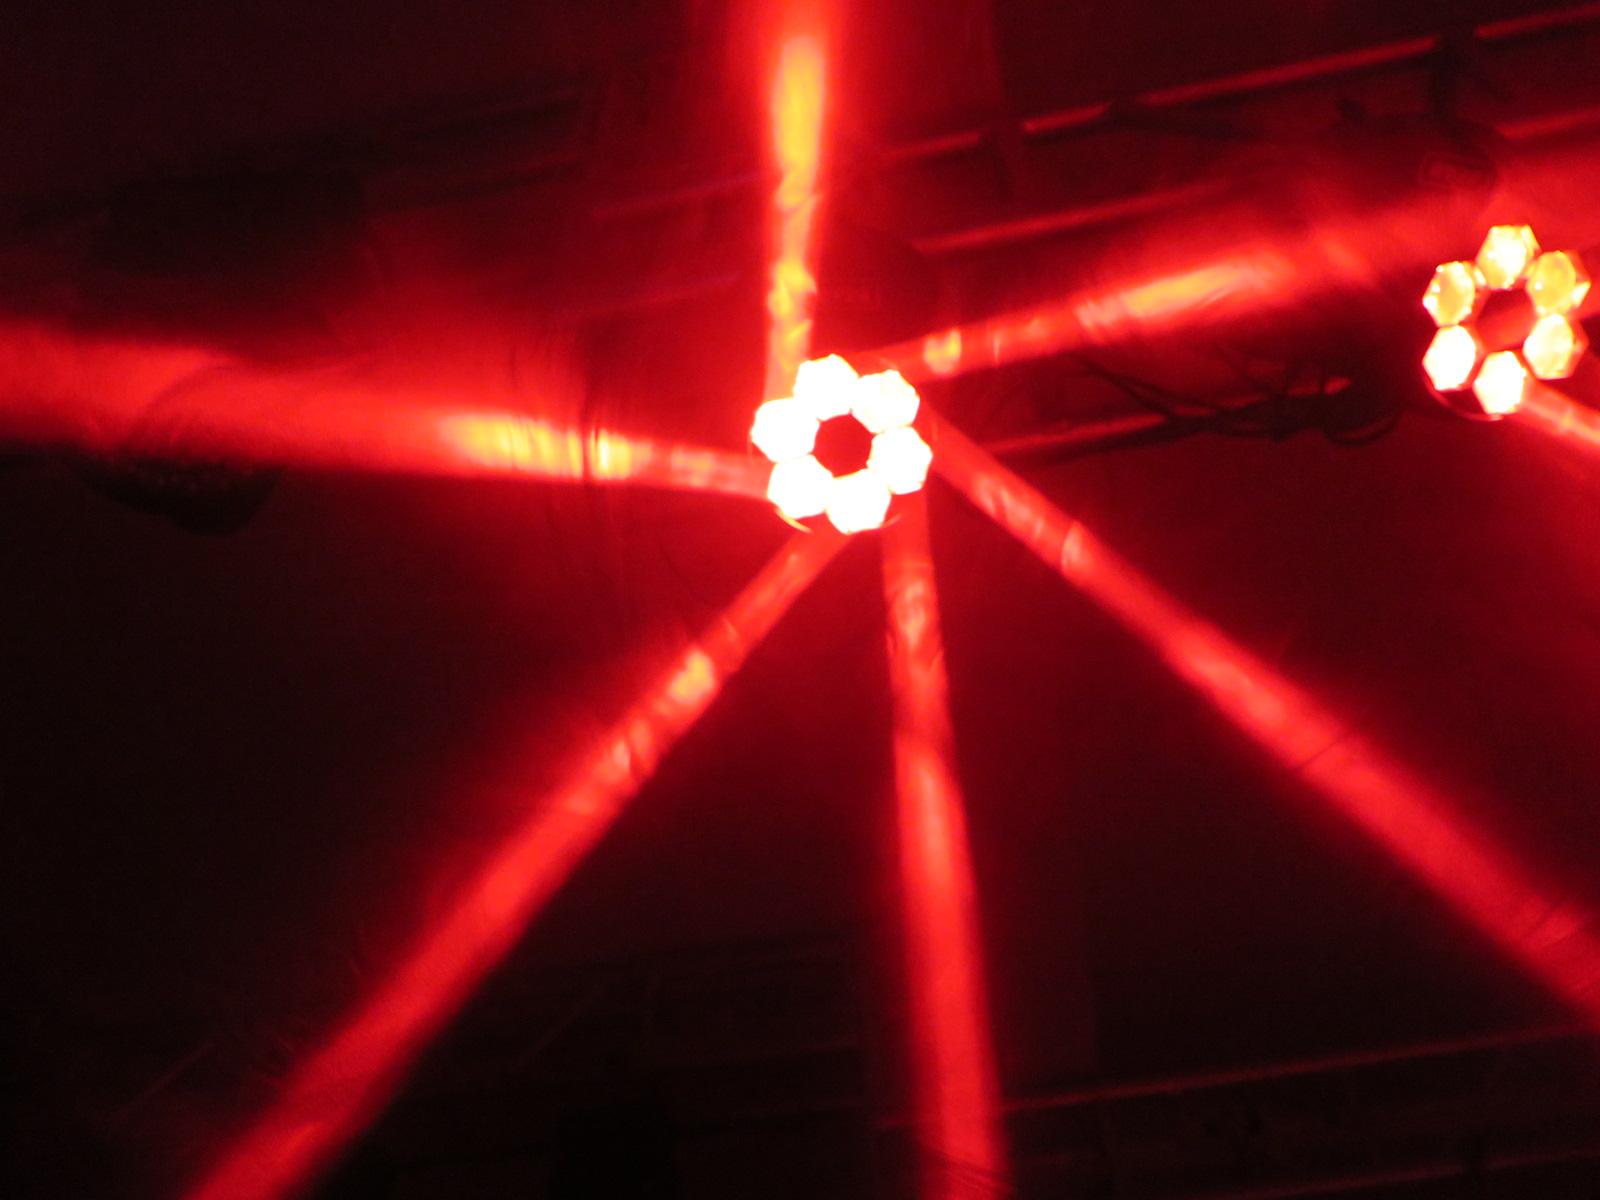 LED6眼无极光束效果图